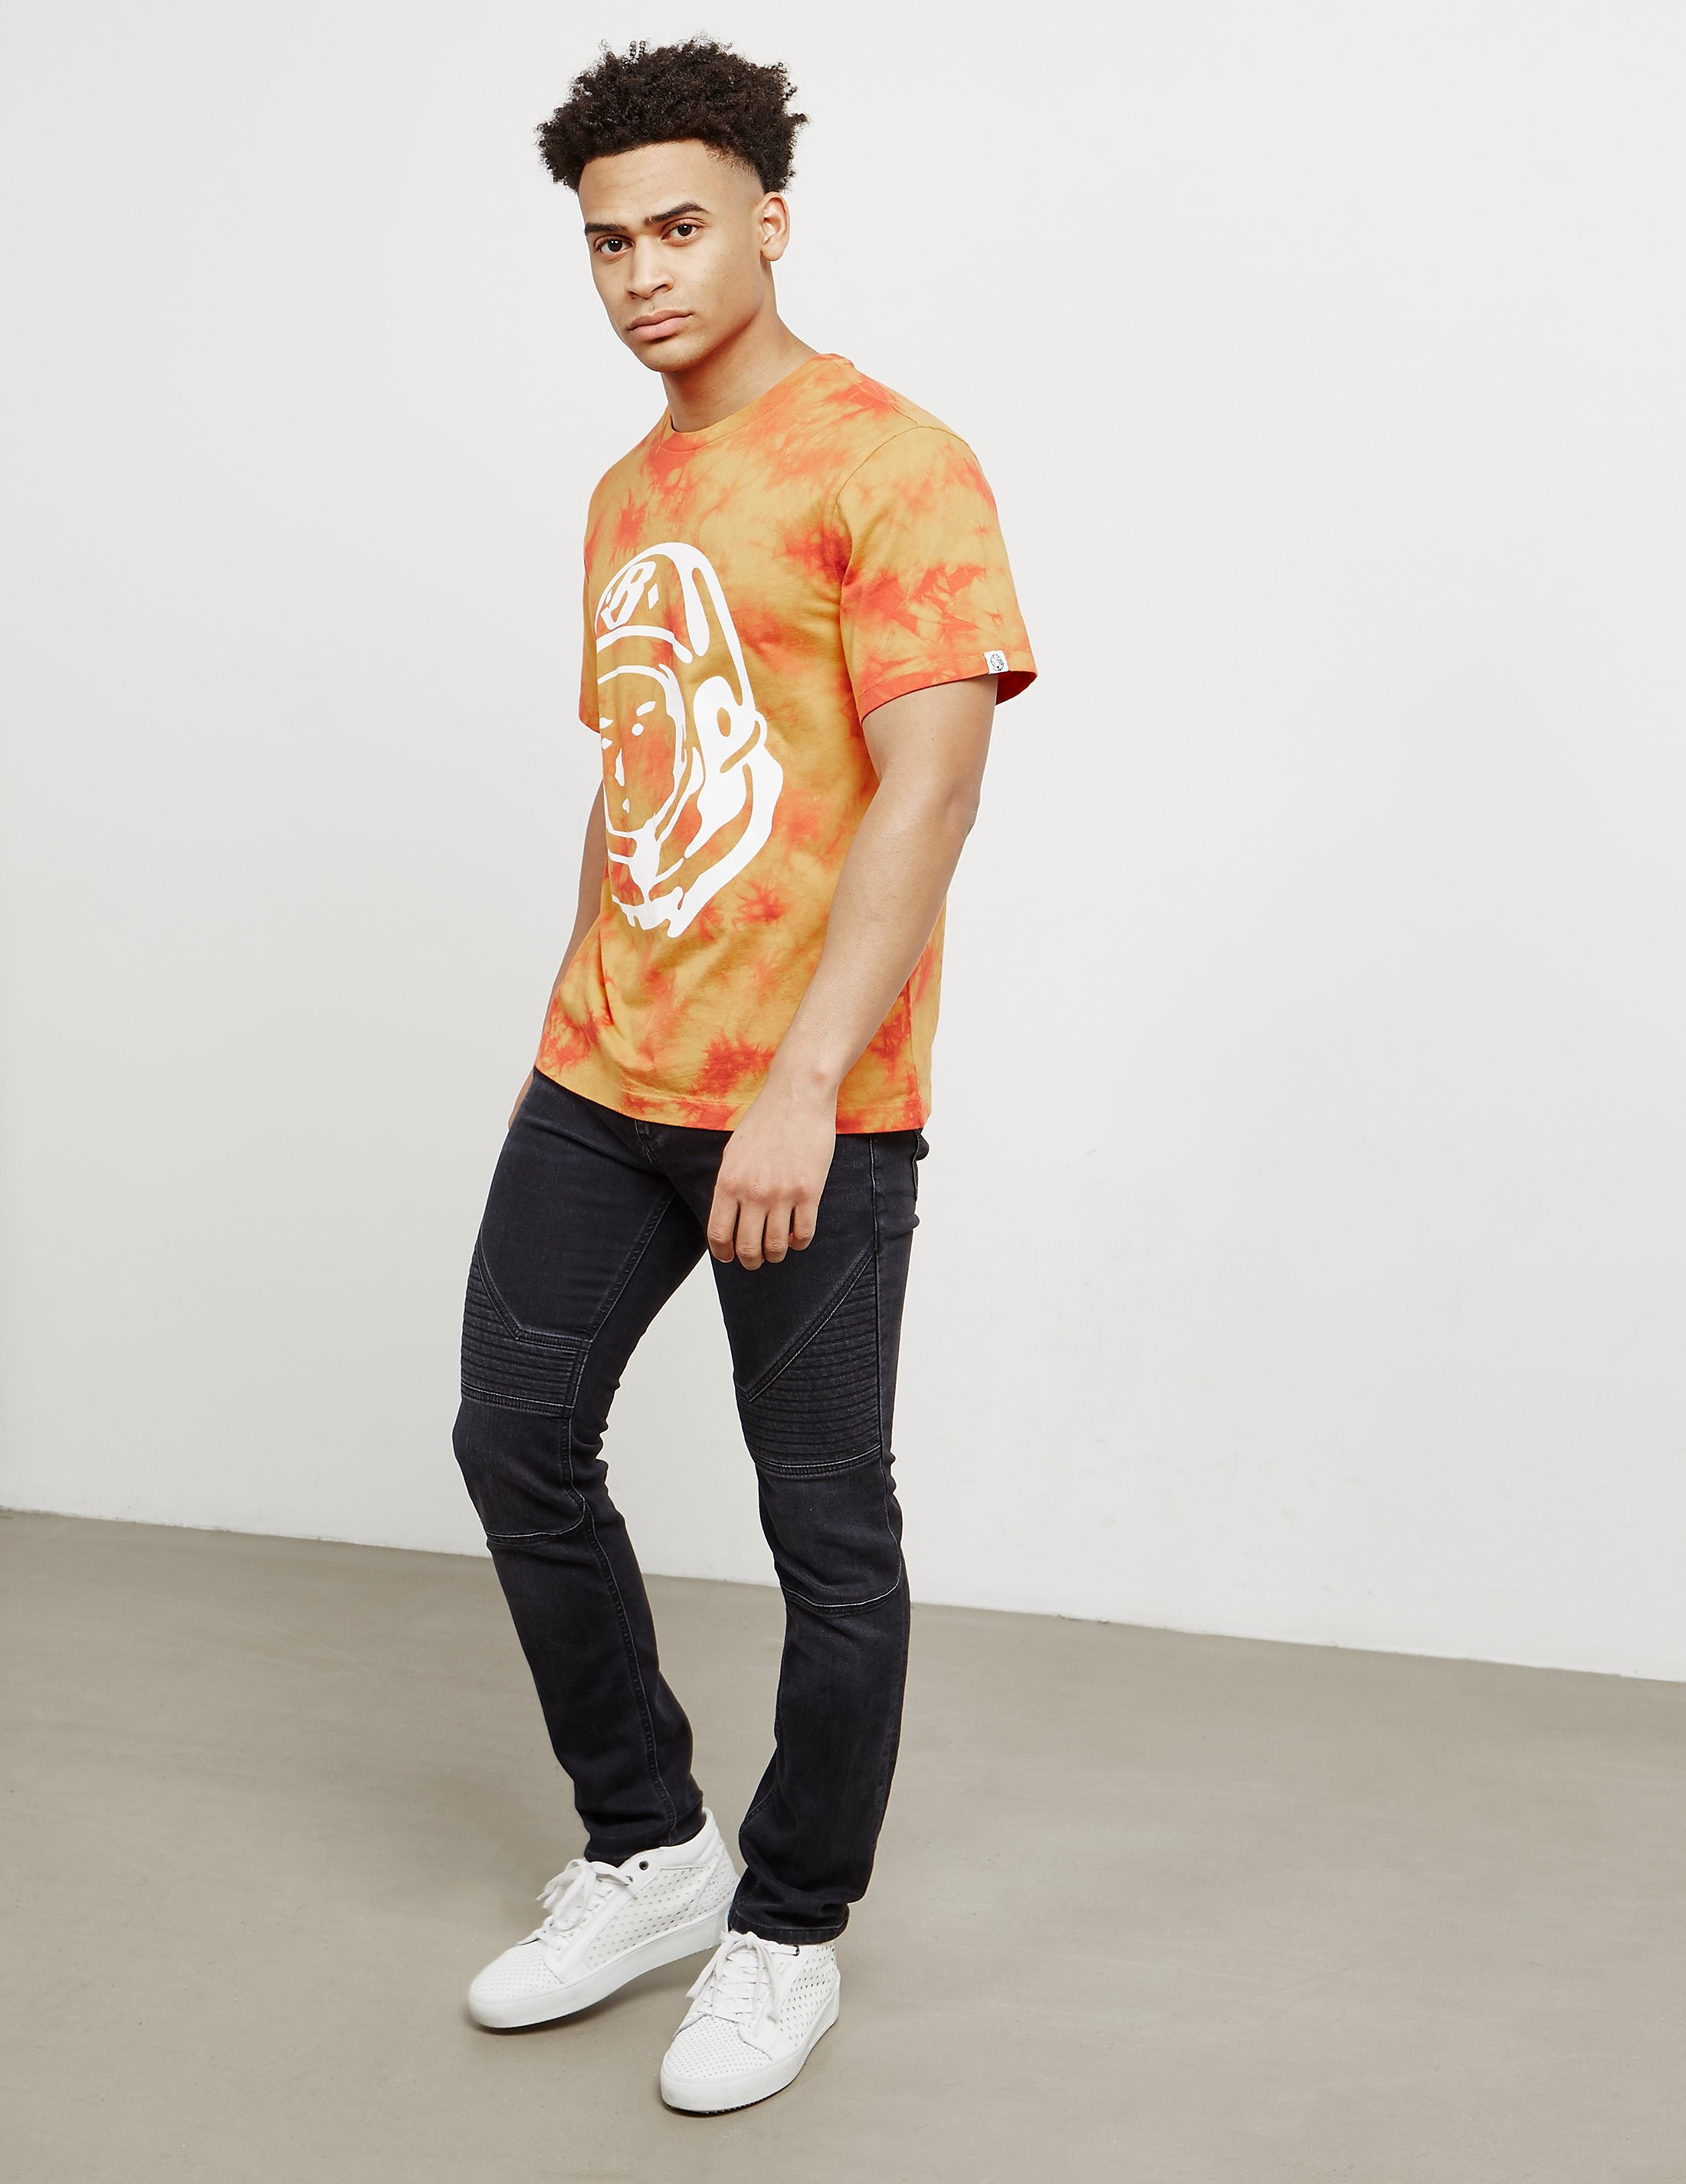 Billionaire Boys Club Tie Dye Short Sleeve T-Shirt